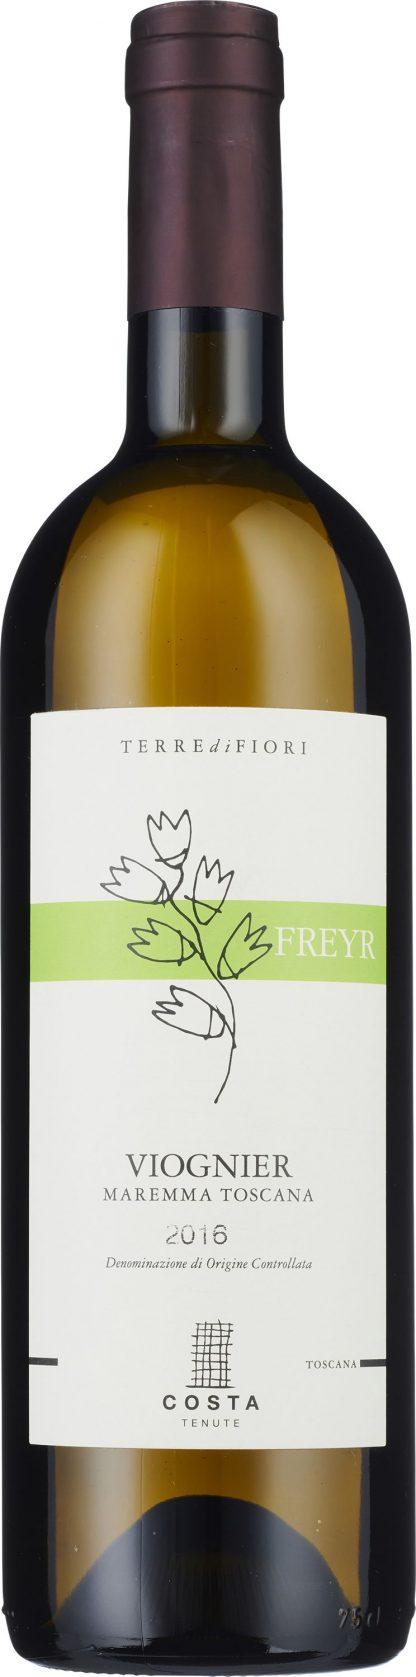 Costa Tenute - Freyr Viognier 2016